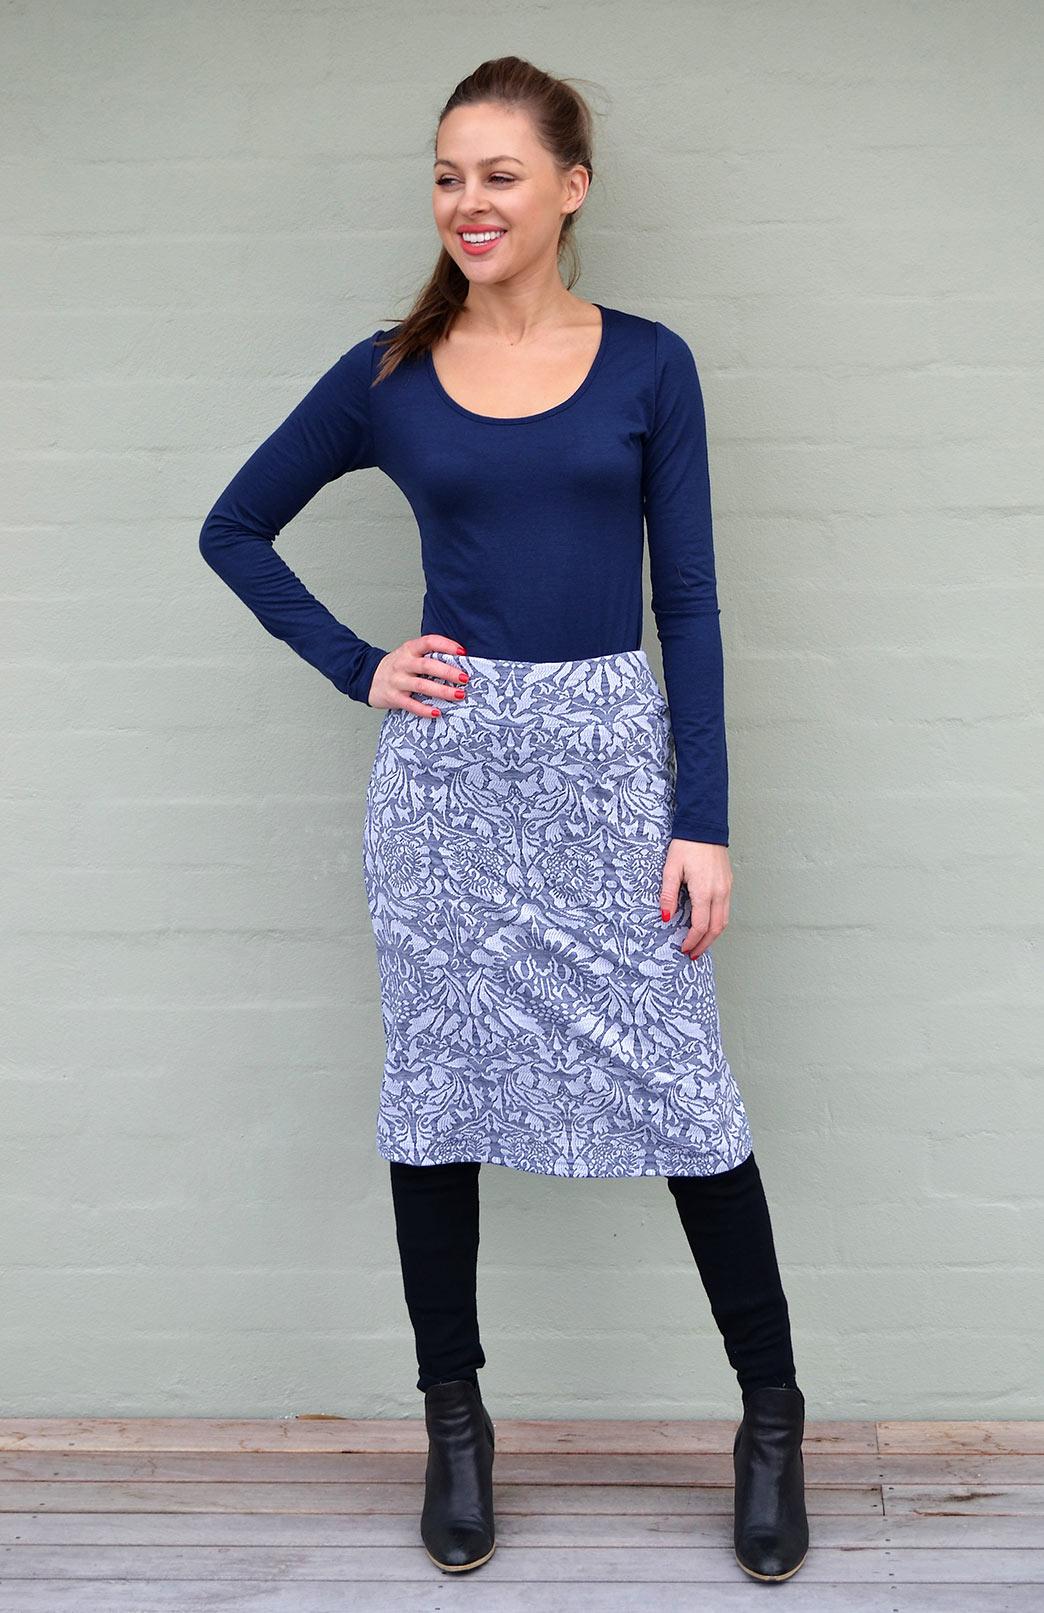 Abbey Floral A-line Skirt - Smitten Merino Tasmania Australia